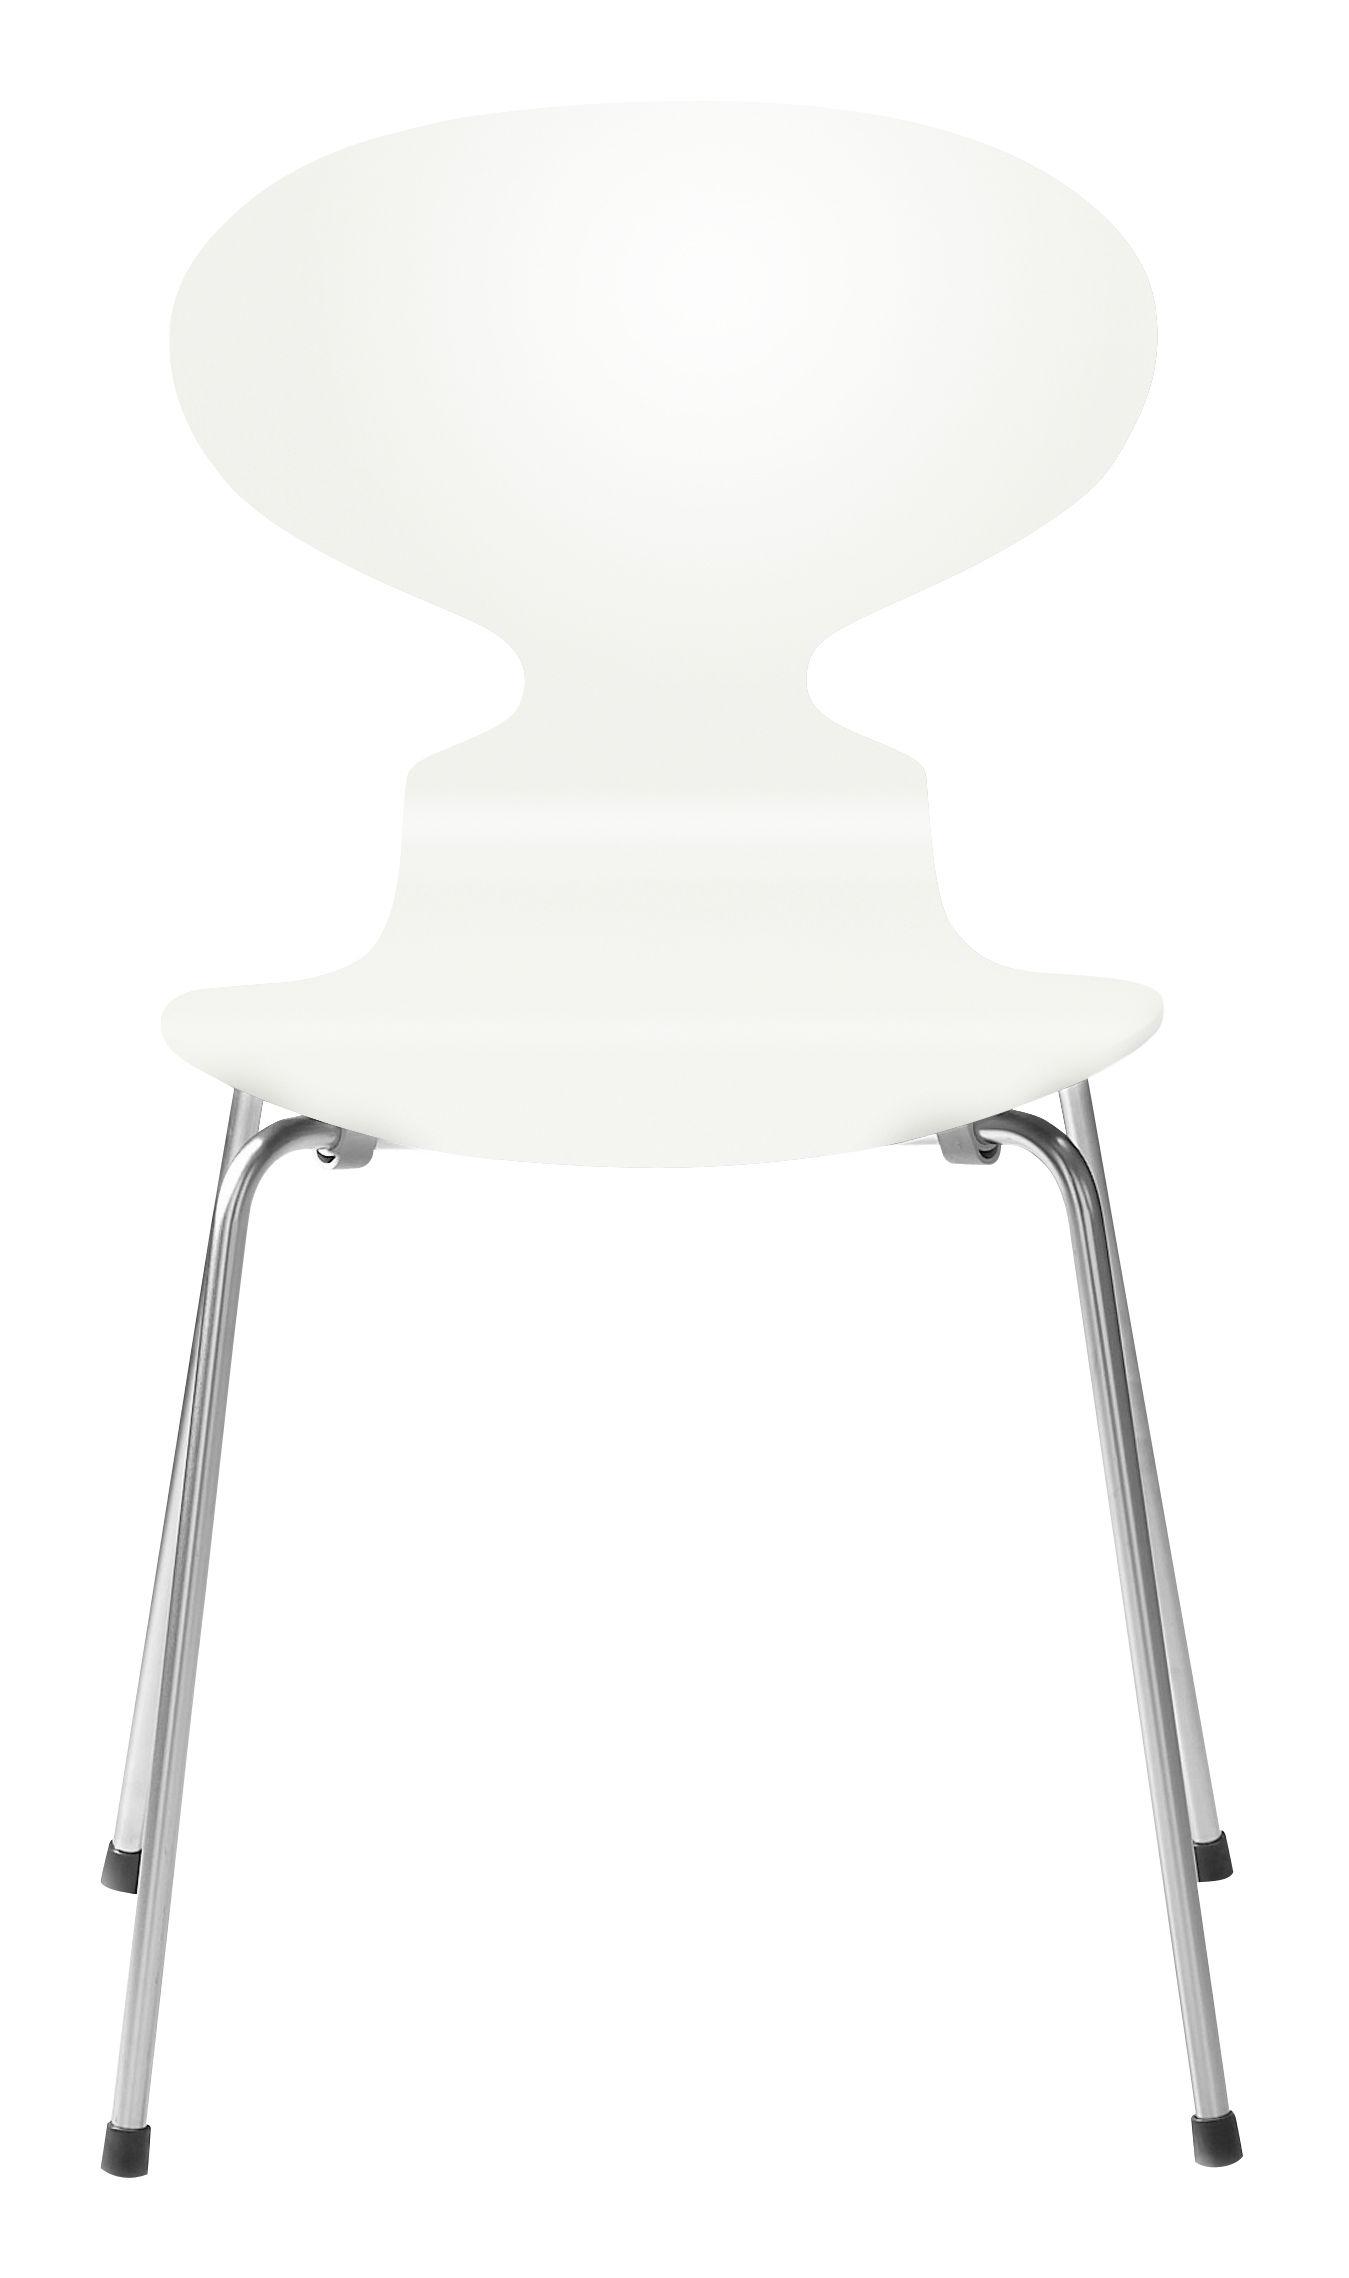 Möbel - Stühle  - Fourmi Stapelbarer Stuhl 4 Füße - Holz lackiert - Fritz Hansen - Weiß lackiert - Contreplaqué de bois laqué, Stahl